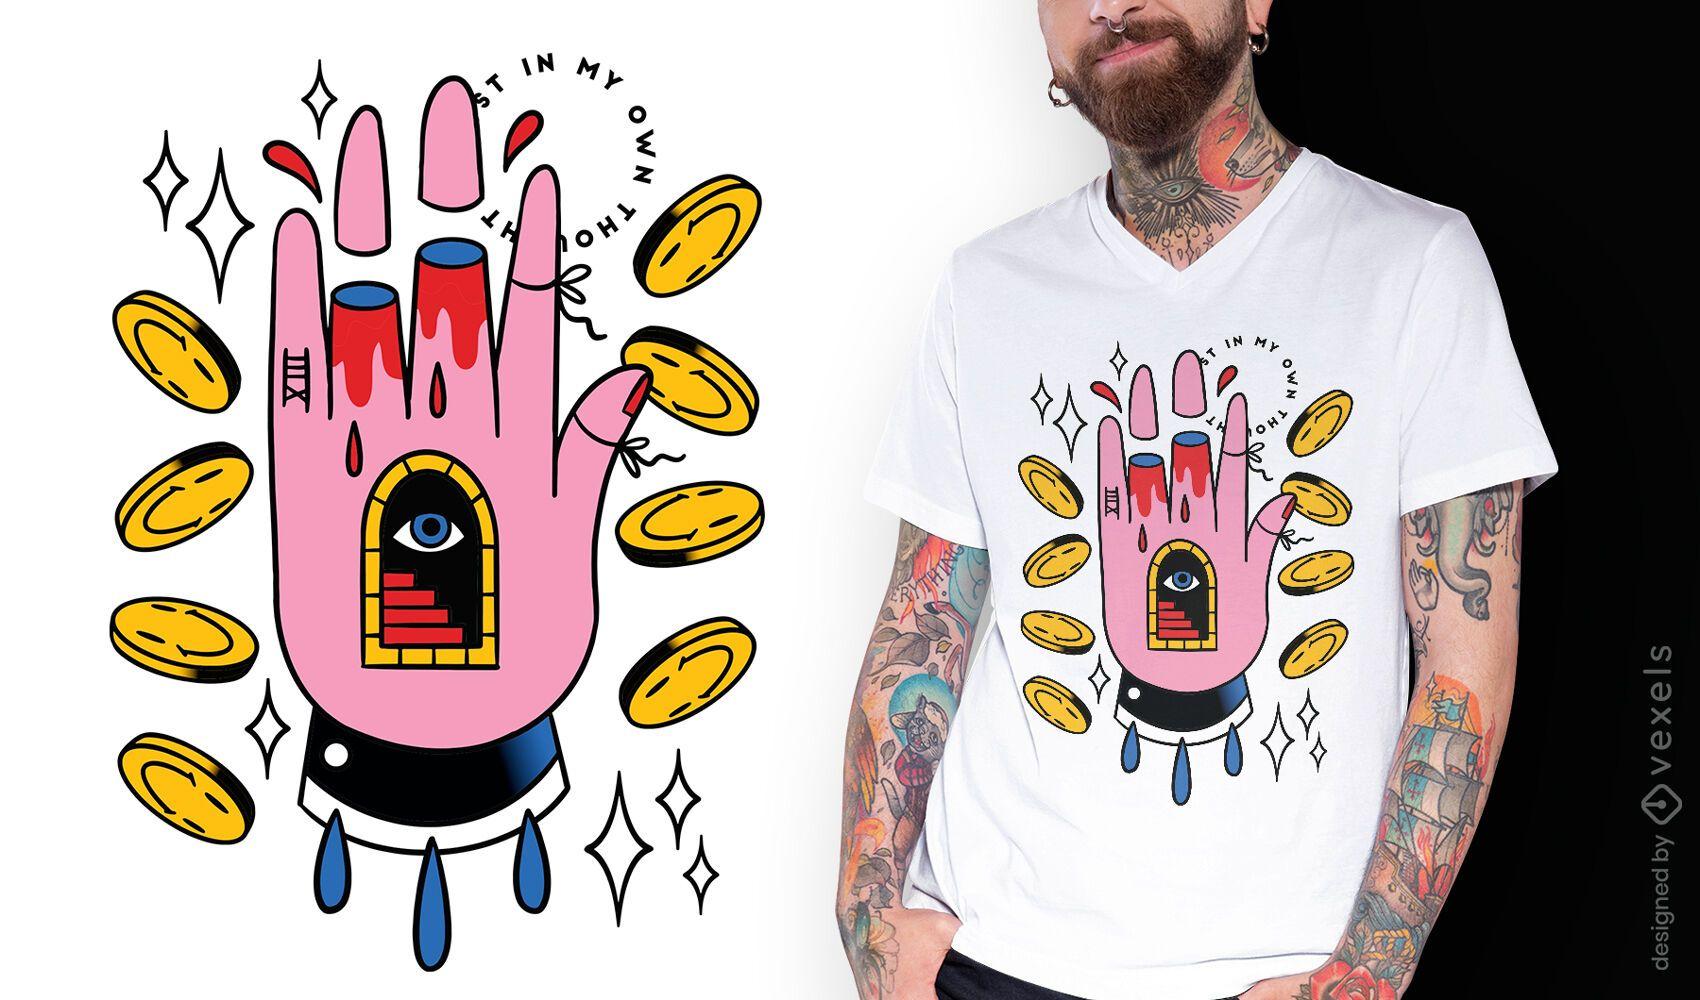 Dise?o de camiseta de tatuaje psicod?lico de mano.